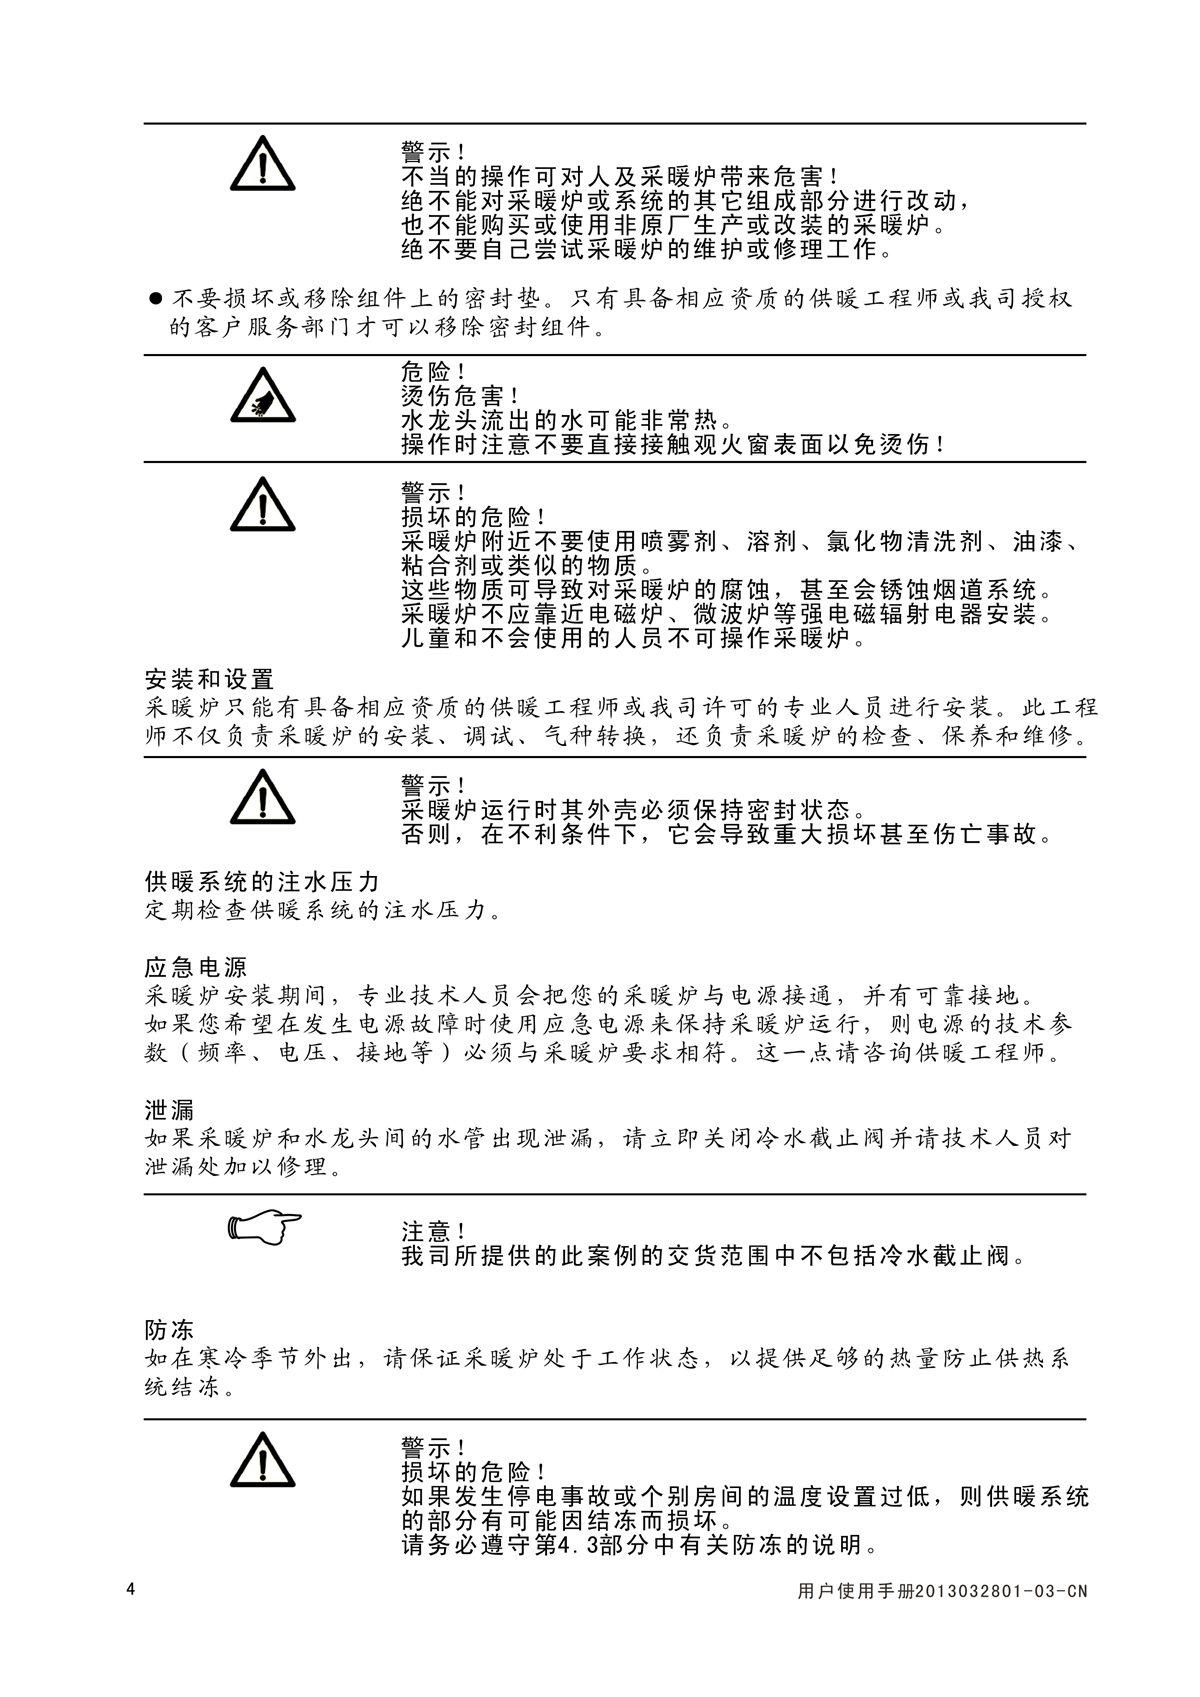 ES02系列-用户使用手册-5_01.jpg